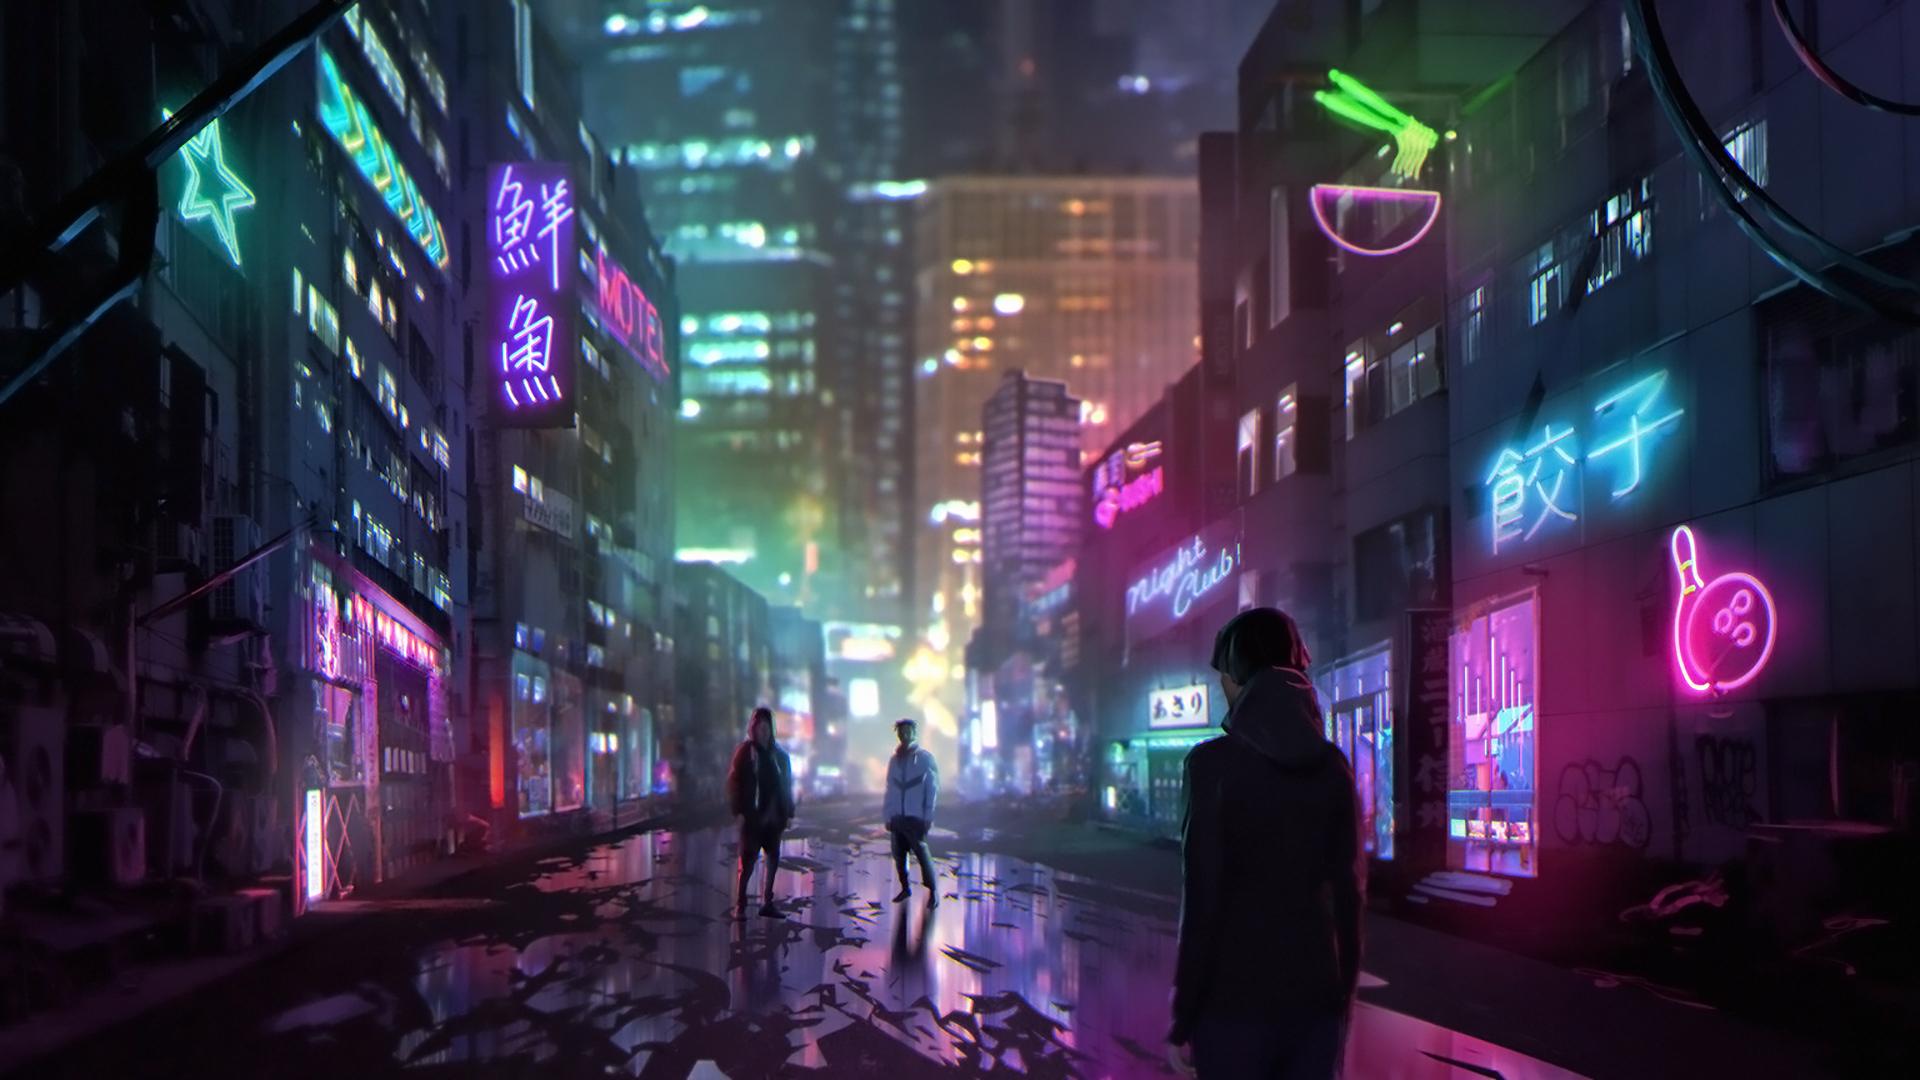 Cyberpunk Hd Wallpaper Background Image 1920x1080 Id